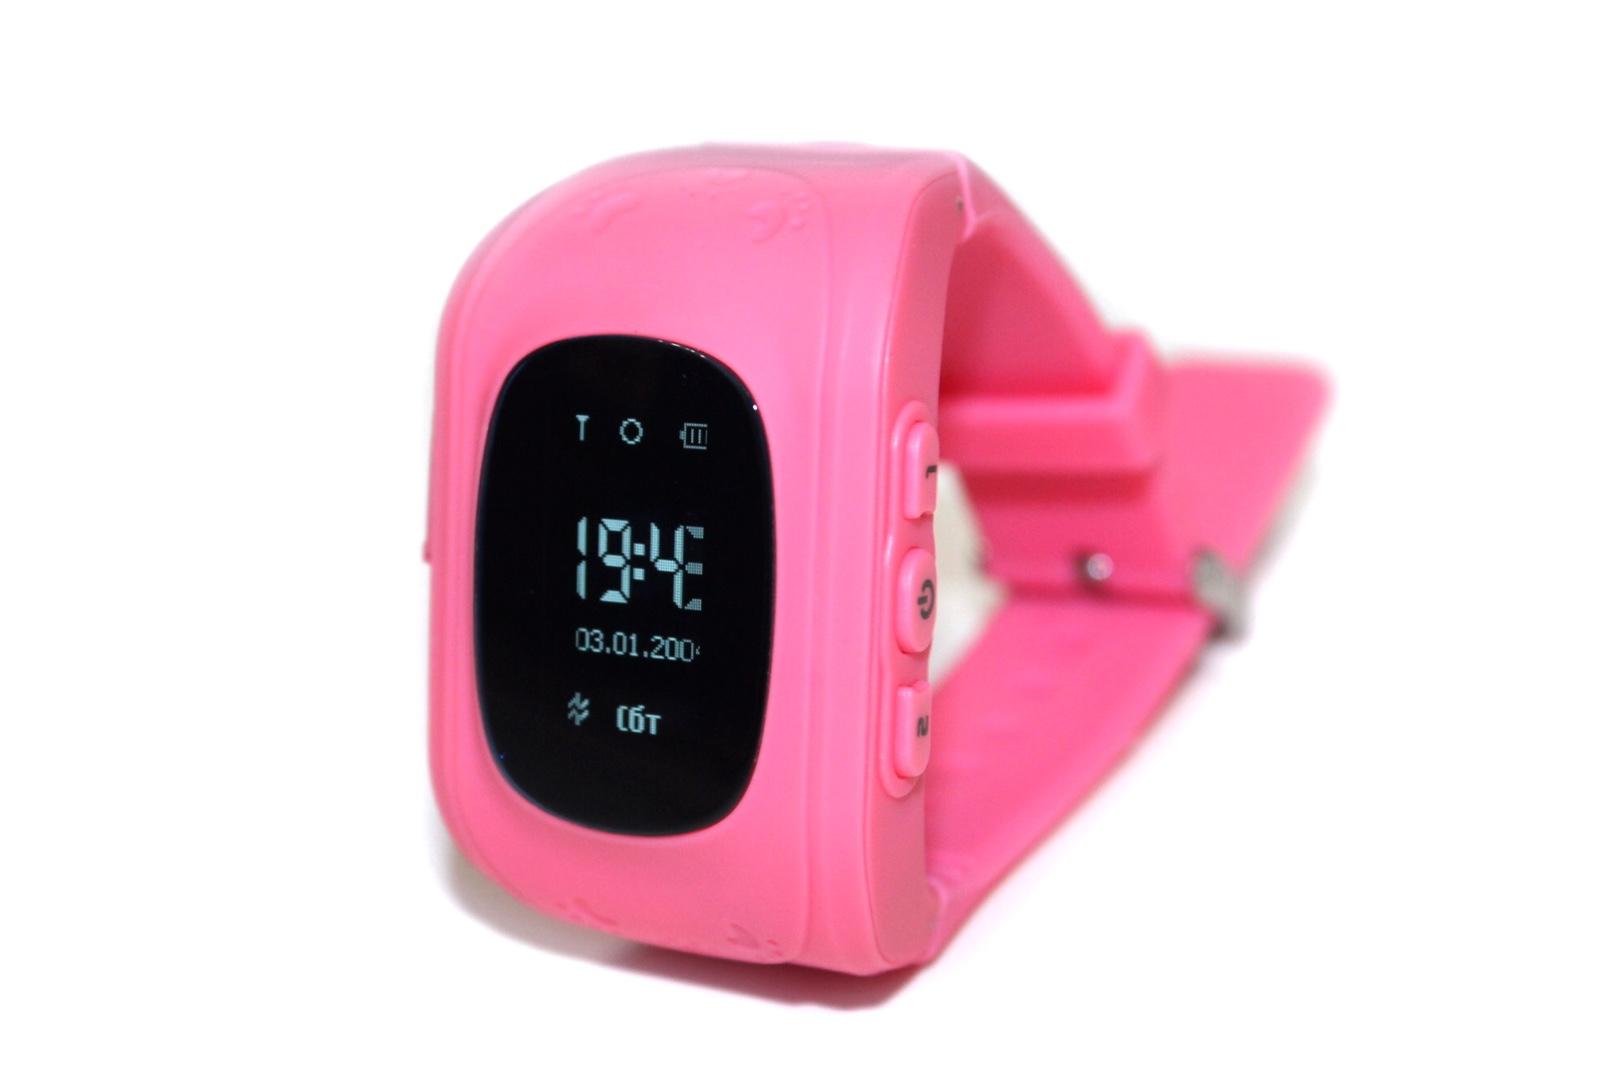 Технические характеристики smart baby watch q наименование модели.